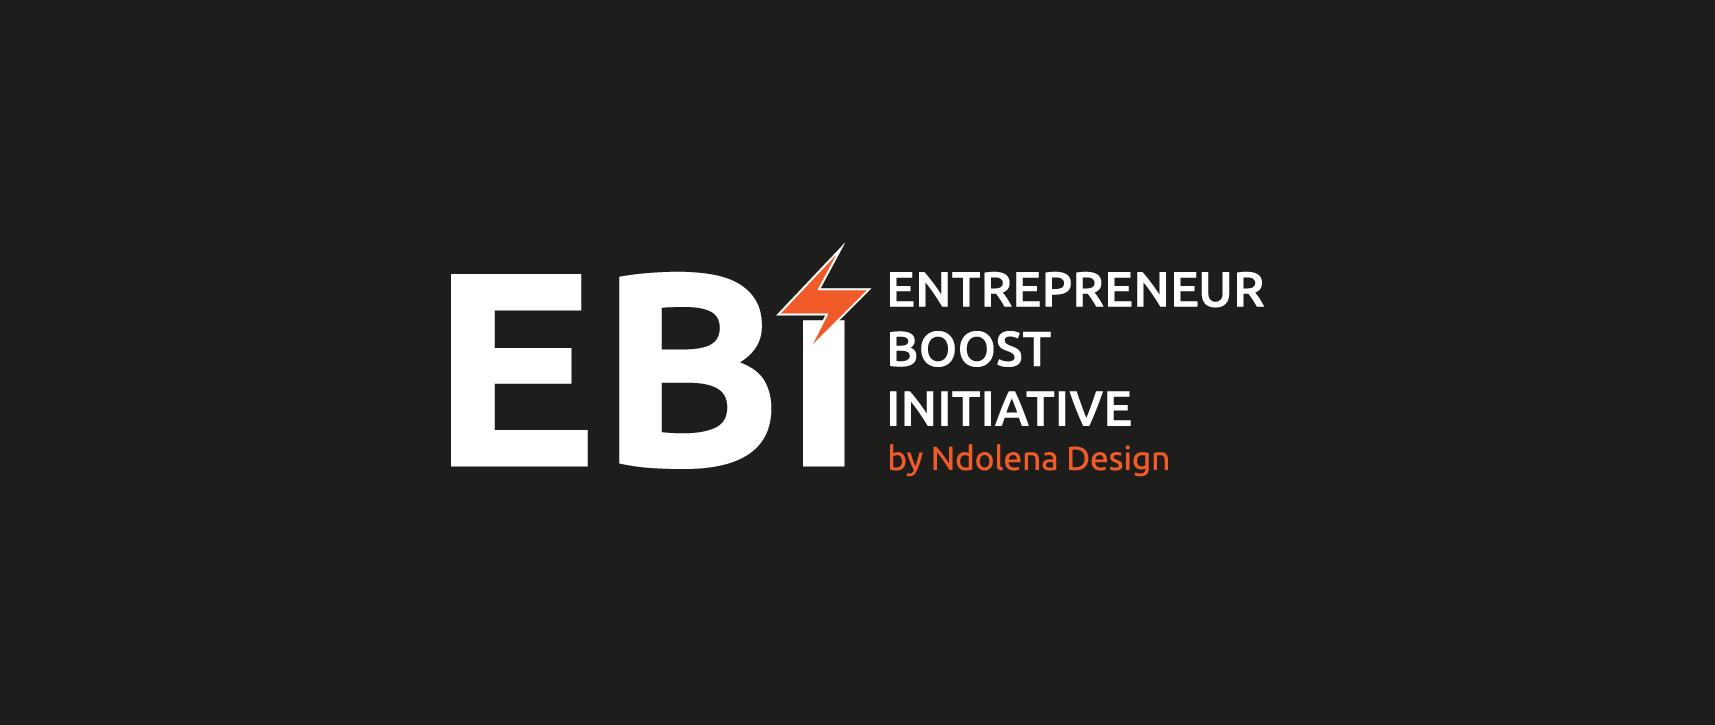 ebi entrepreneur boost initiative - wbgo_WIDE_SHORT_B-card examples